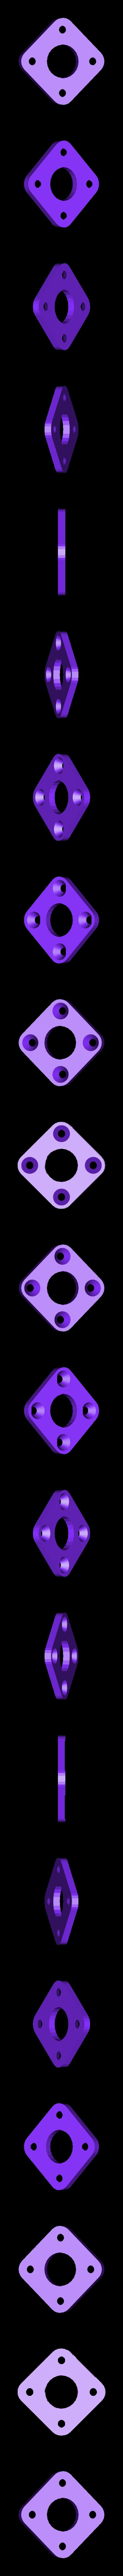 Stab_Capot_ContreSemelle.stl Download STL file Shoulder pad for DSLR type GH4, 5D • 3D print design, Smile